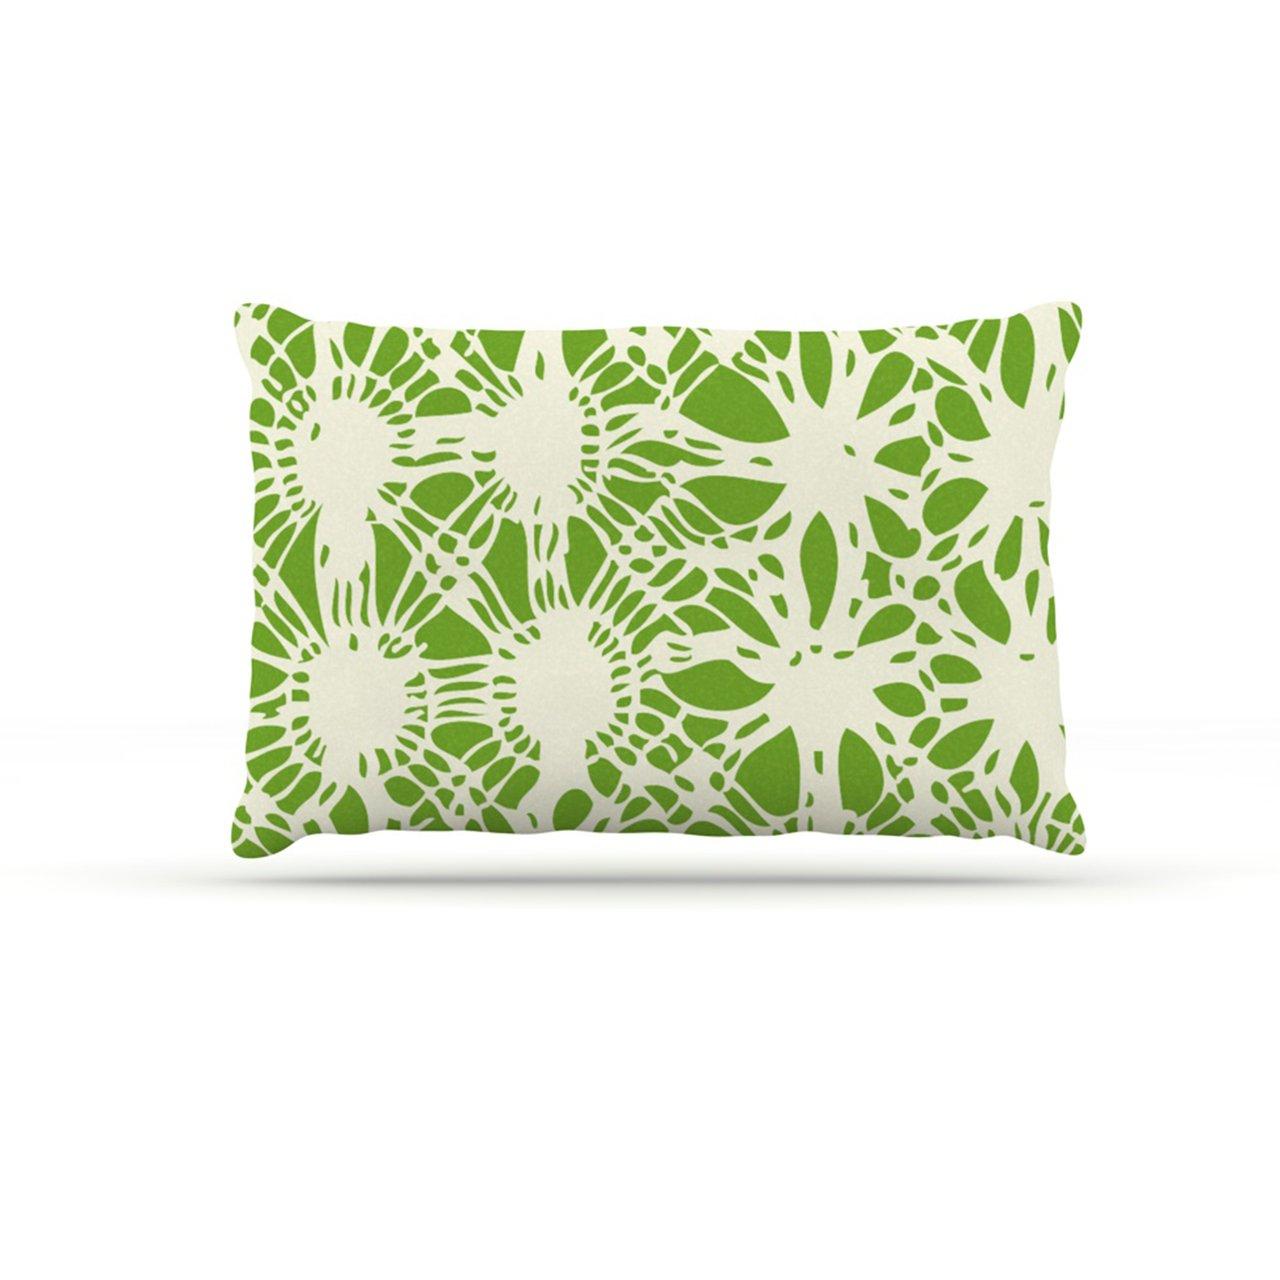 30 by 40\ Kess InHouse Laura Nicholson Drawnwork  Green White Fleece Dog Bed, 30 by 40